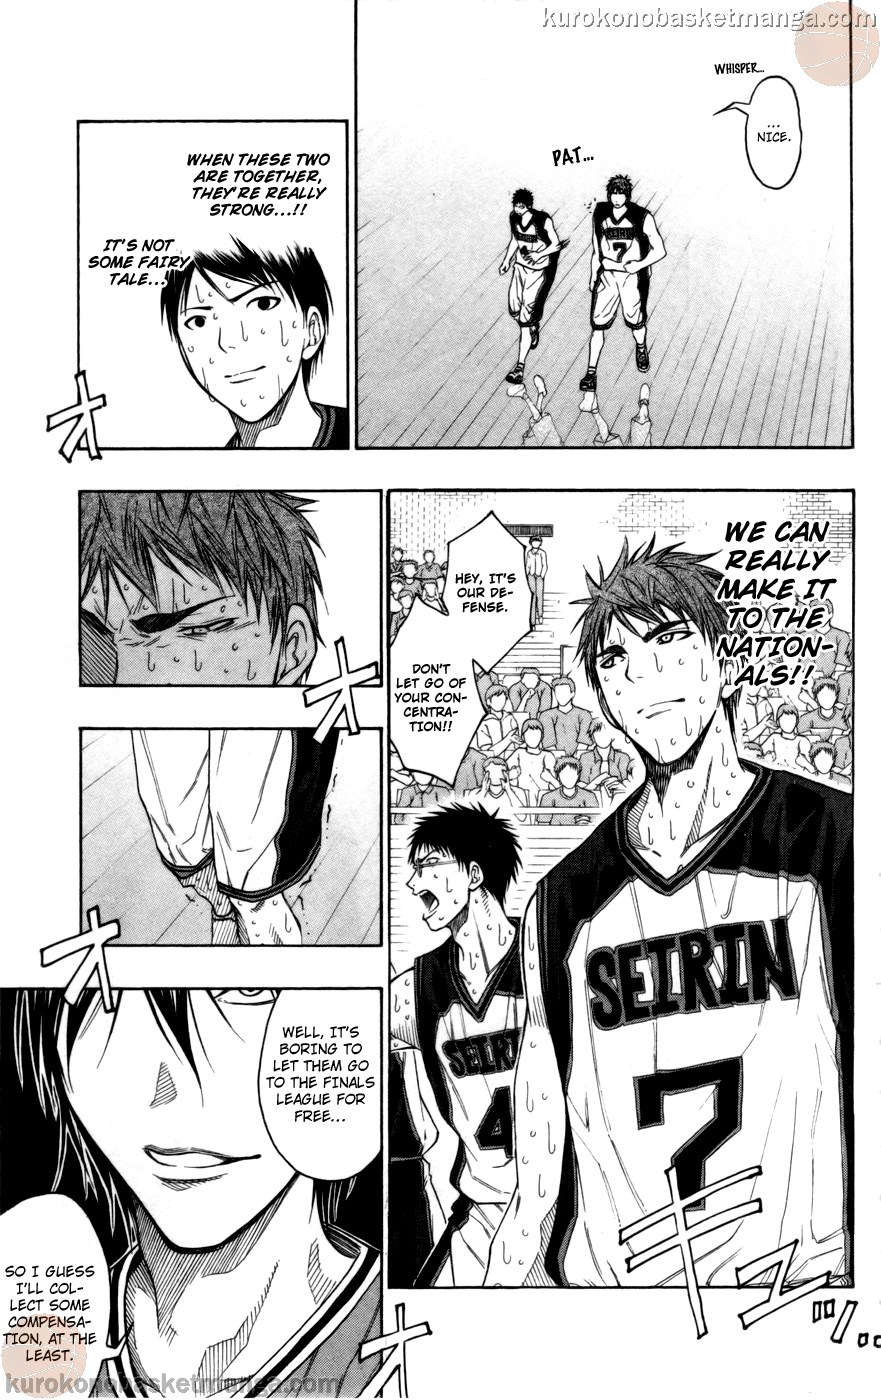 Kuroko no Basket Manga Chapter 98 - Image 18